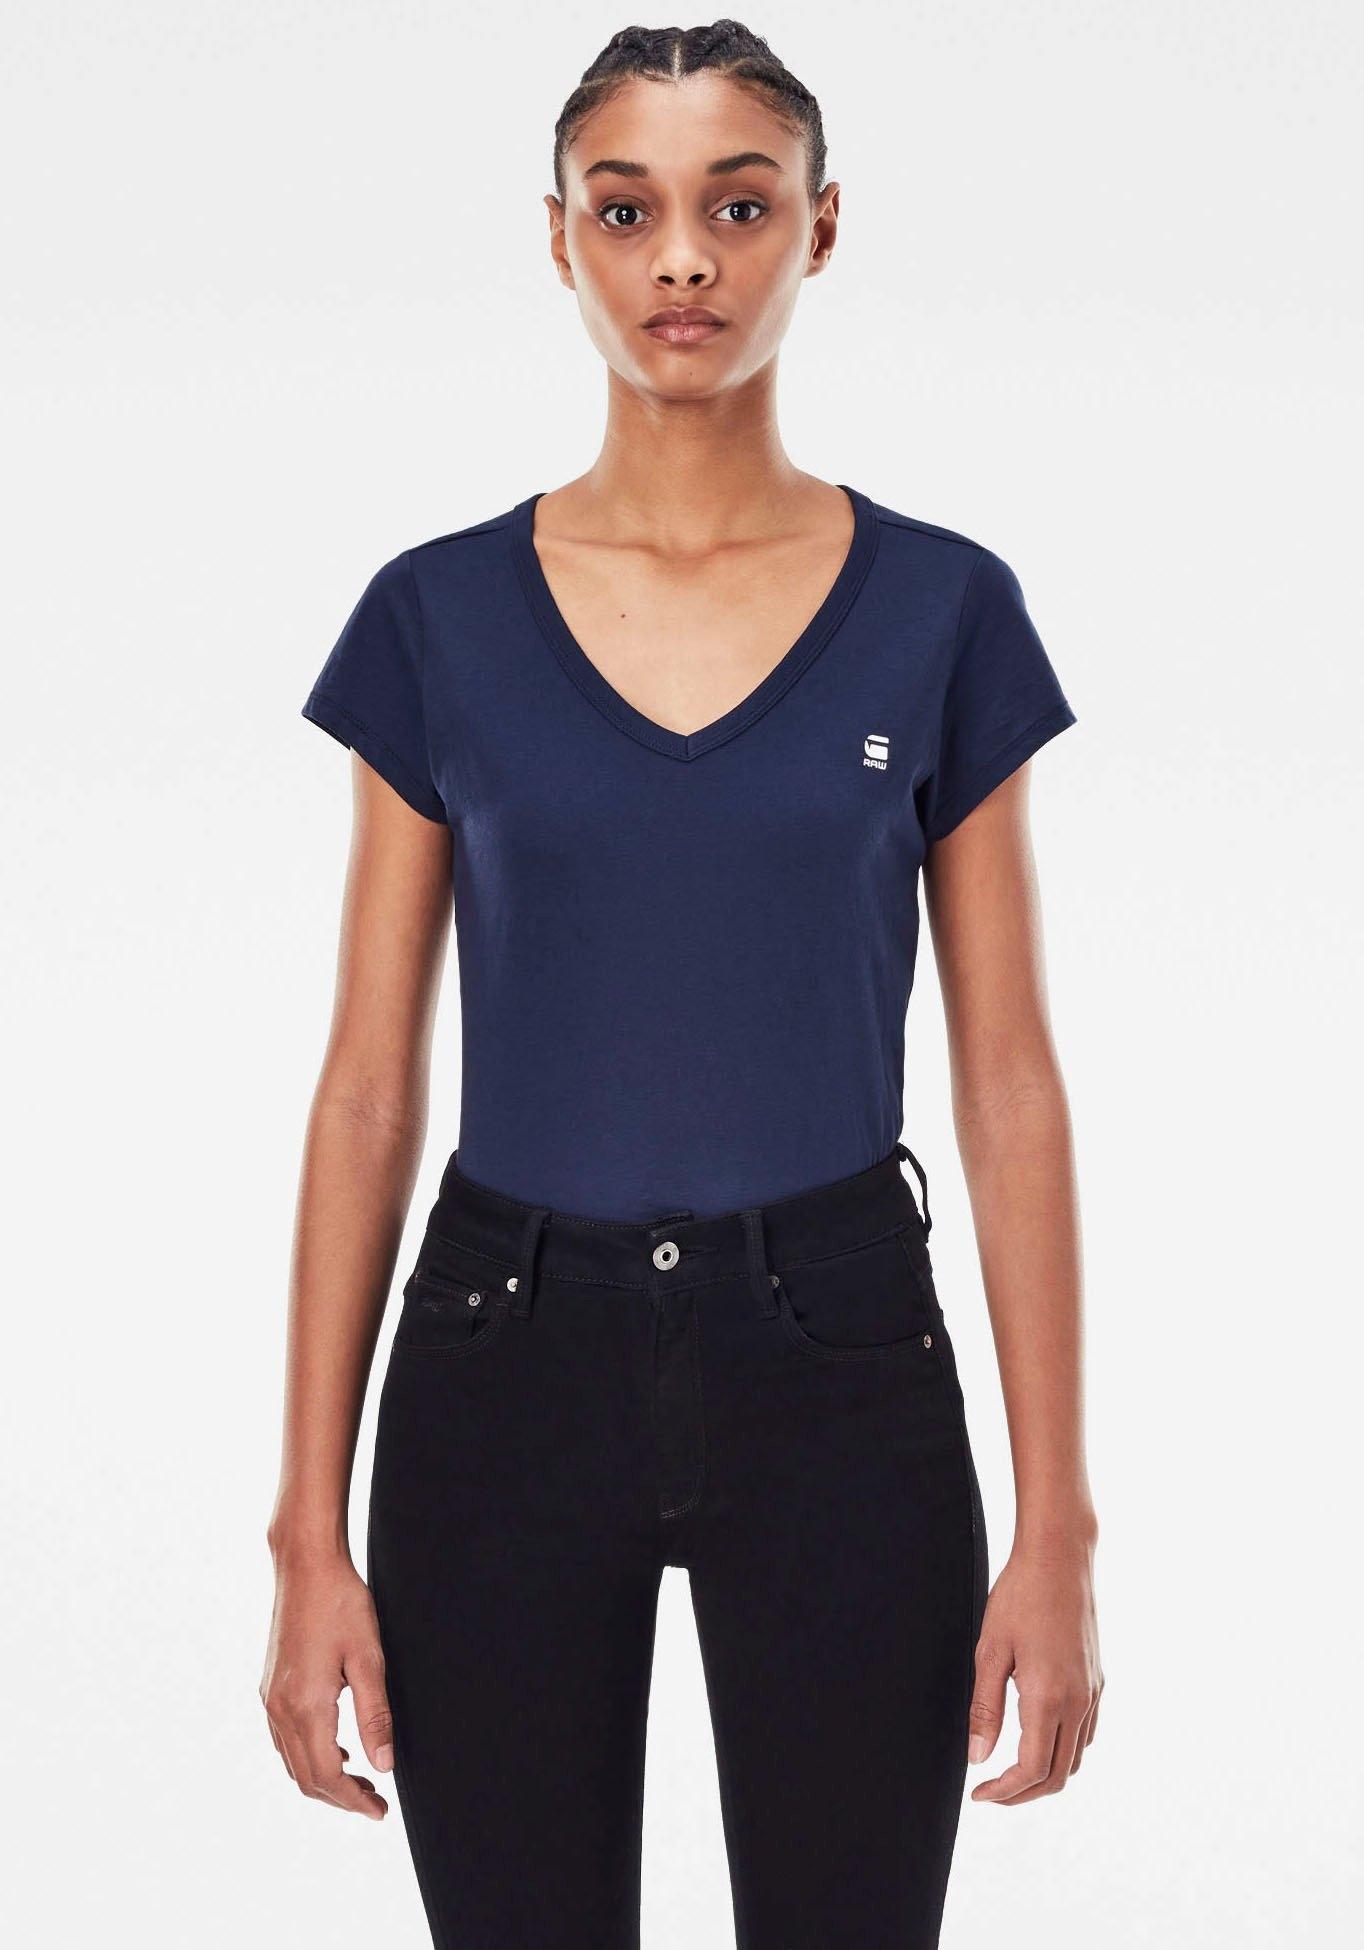 G-Star RAW T-shirt Eyben Slim Top met kleine logo-frontprint bestellen: 30 dagen bedenktijd